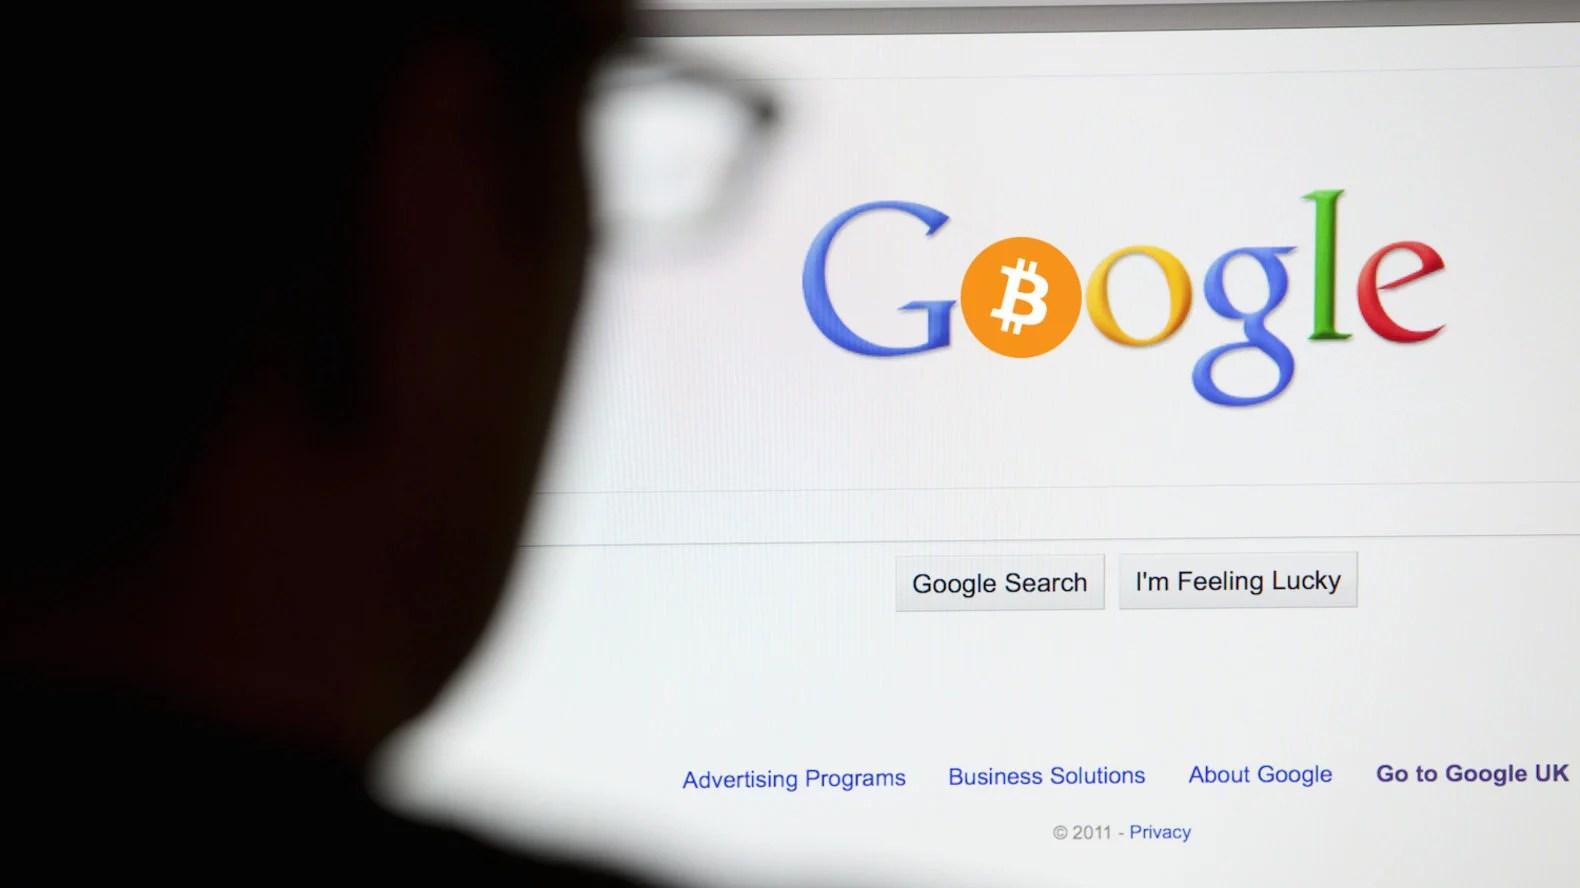 Bitcoin se posiciona en las búsquedas mundiales de Google, alcanzando un máximo de 3 meses